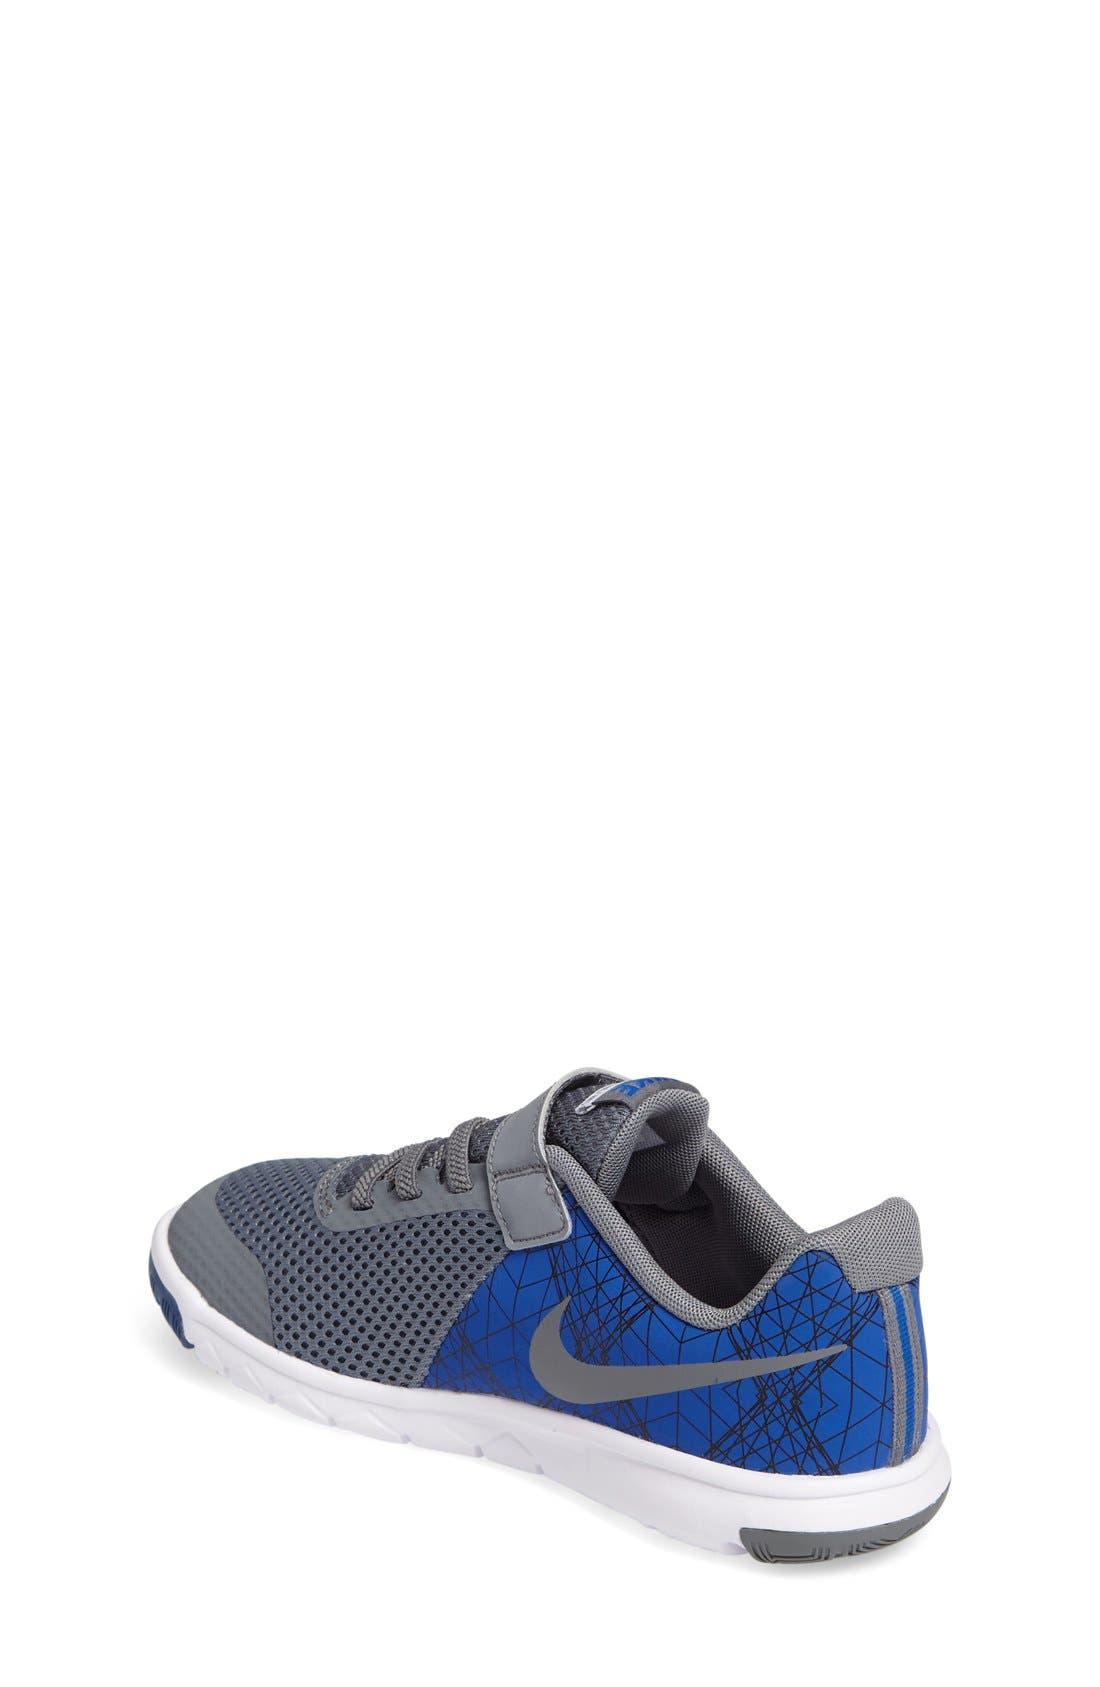 Alternate Image 2  - Nike 'Flex Experience 5 Print' Running Shoe (Toddler & Little Kid)